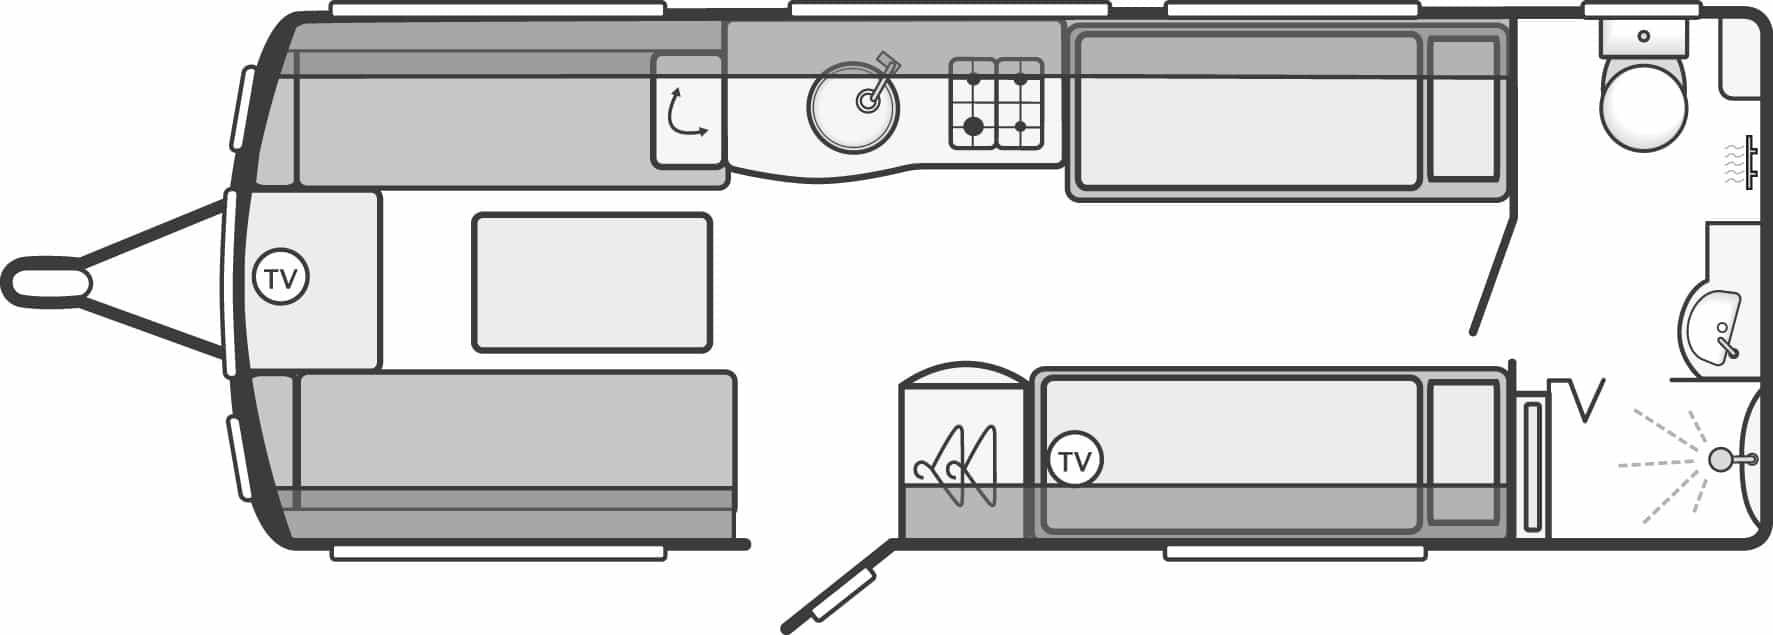 Elegance 565 - 4 Berth, Two Single Beds, End Washroom